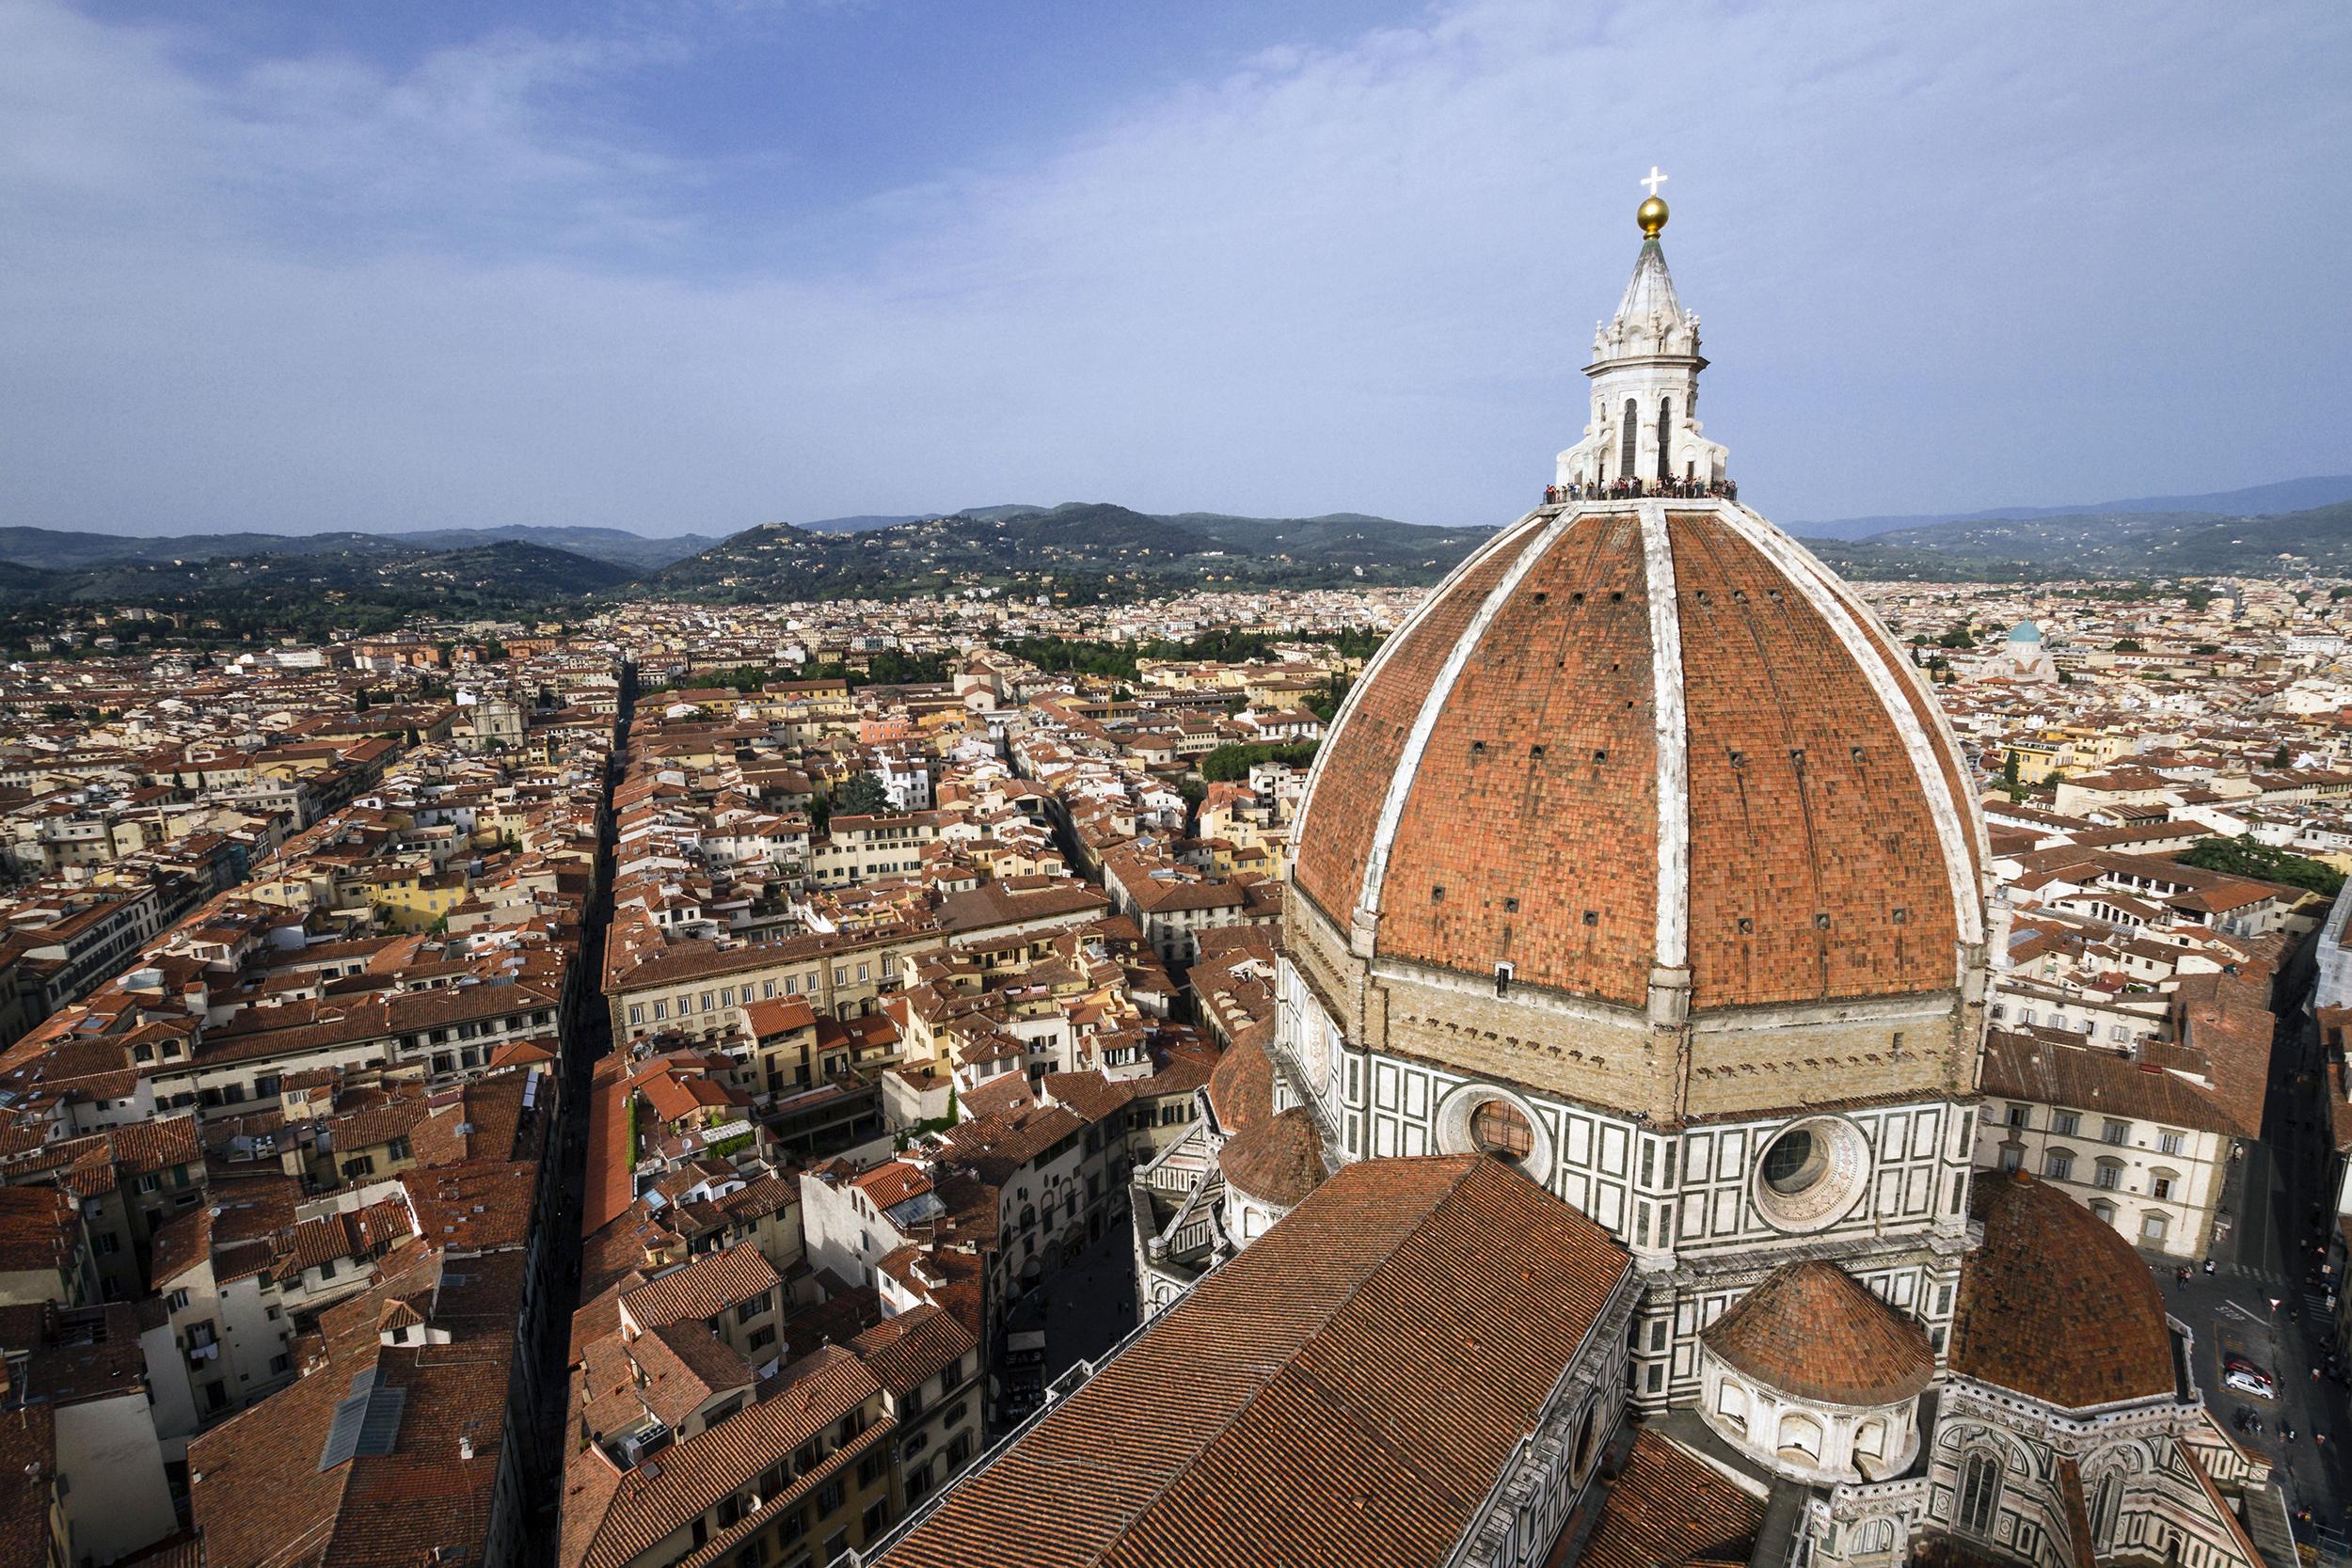 Duomo of florence photo